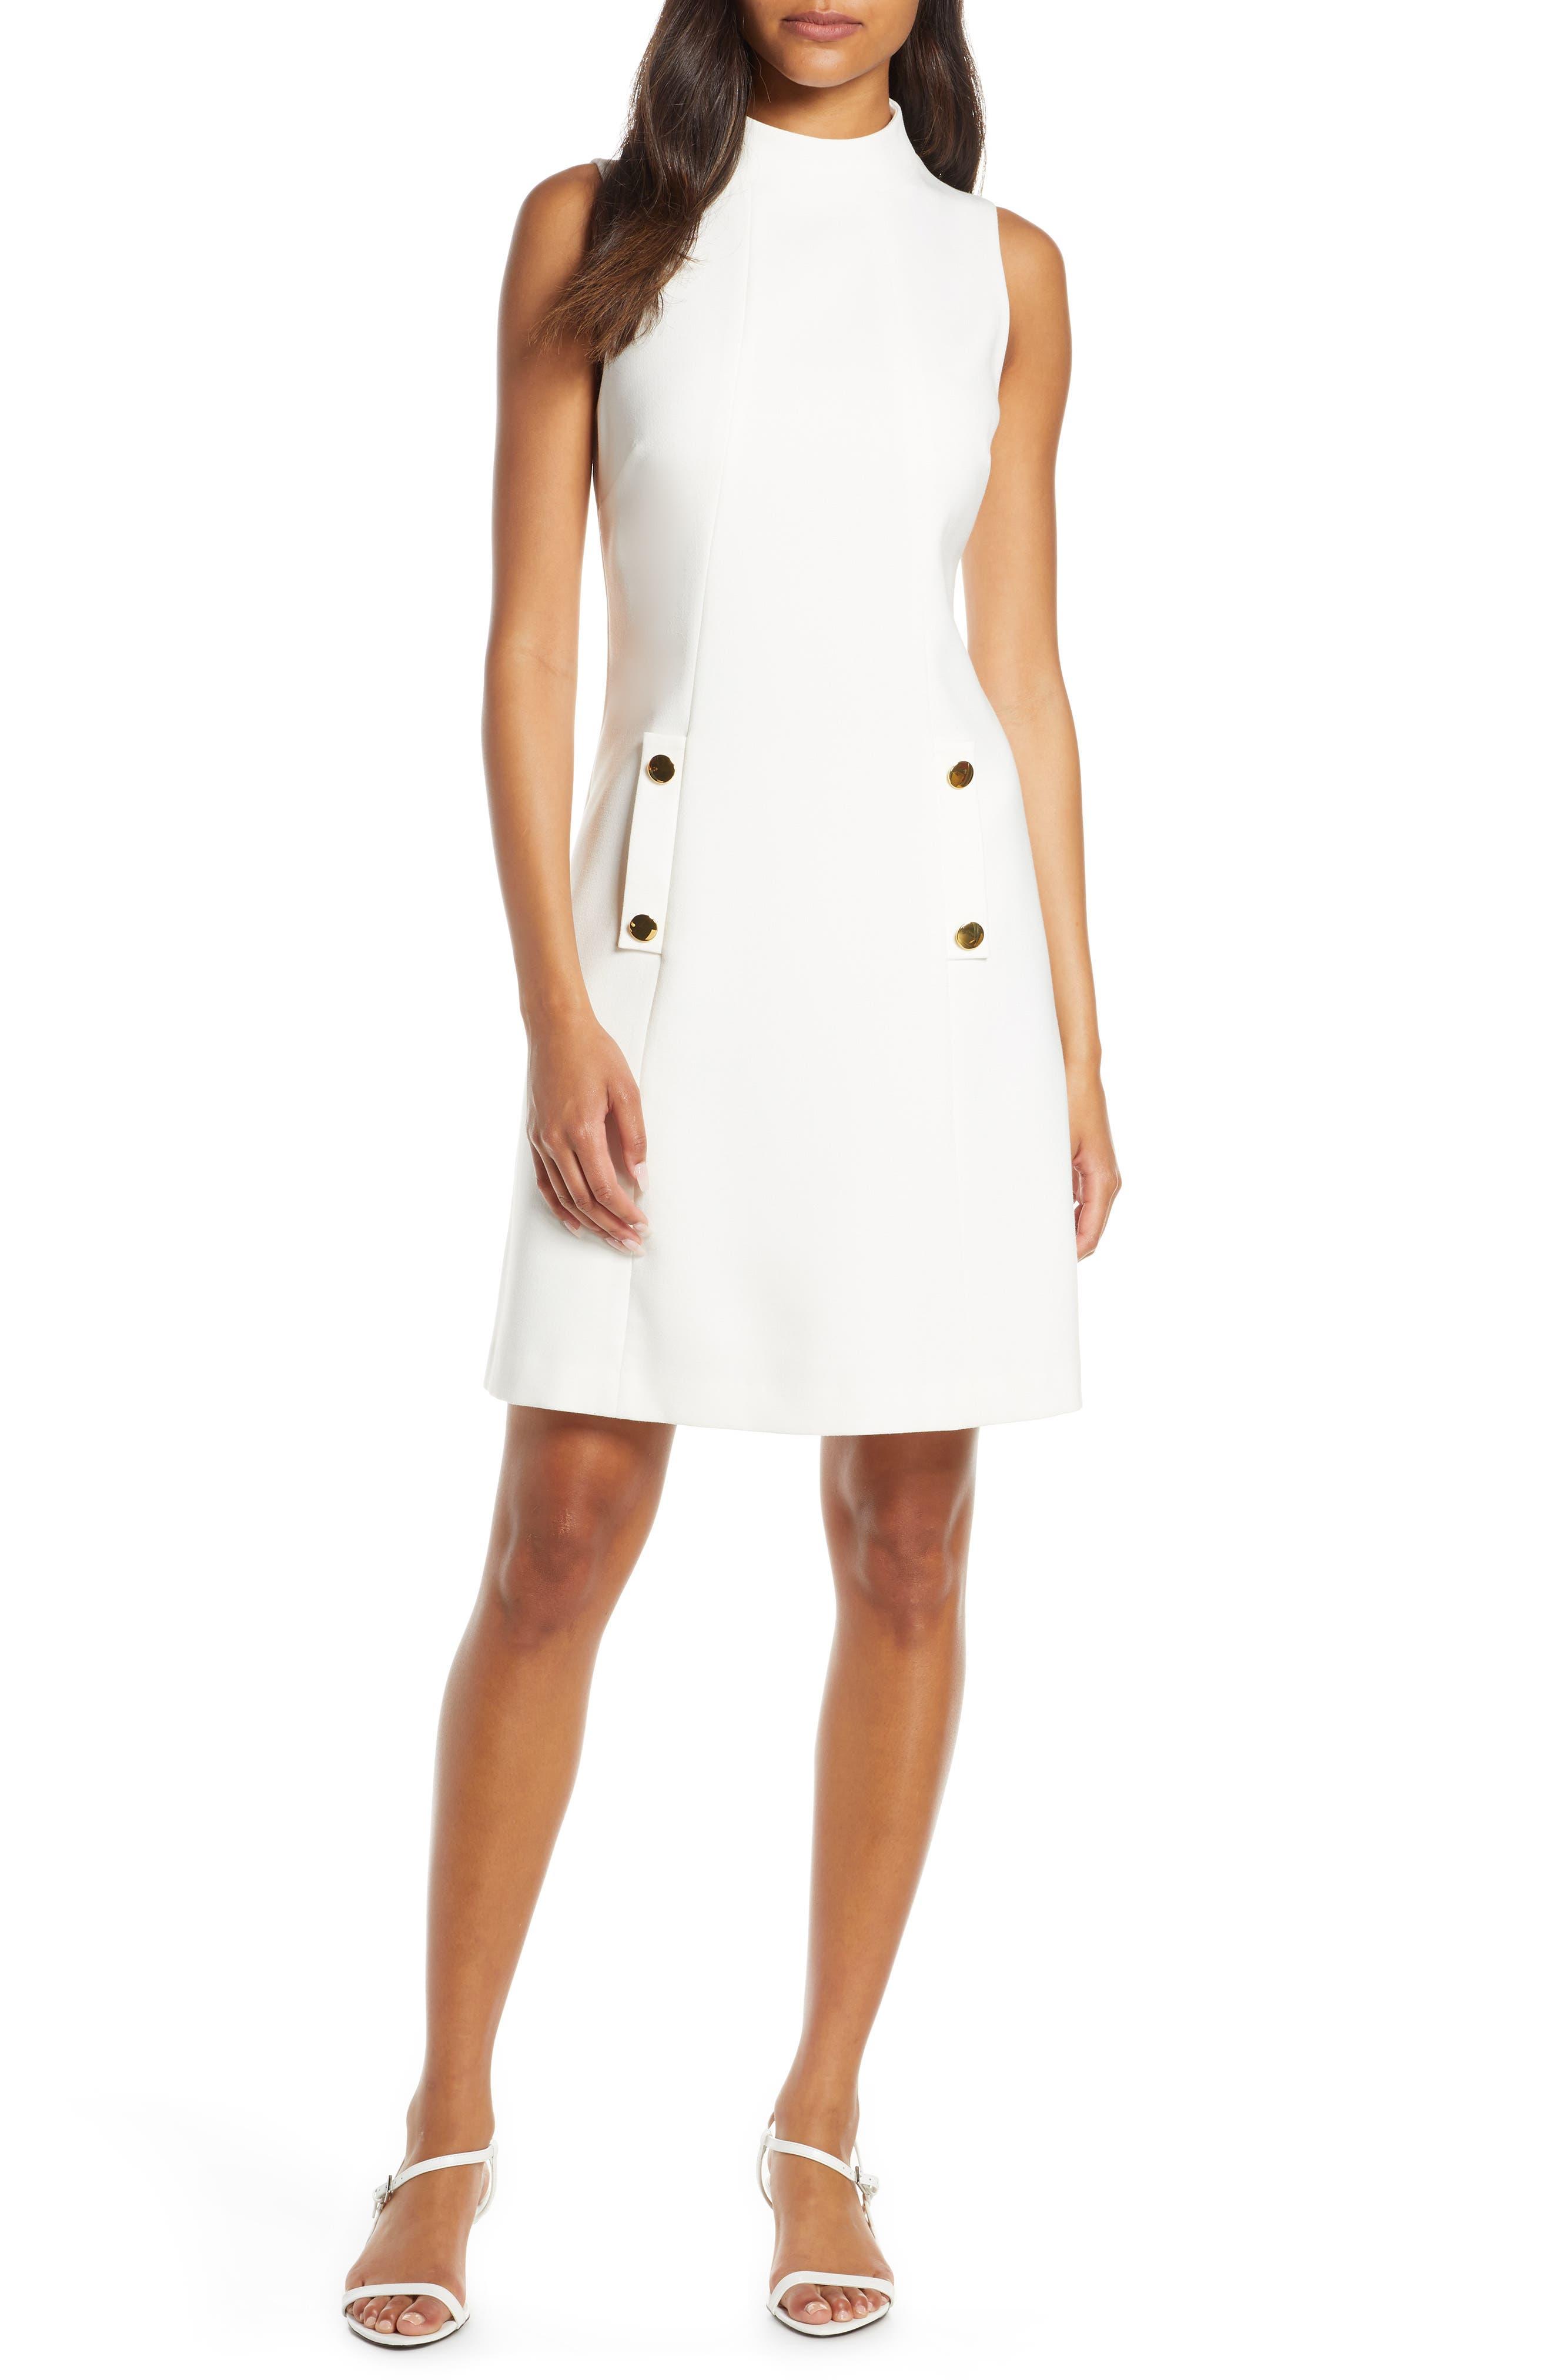 Petite Harper Rose High Neck Dress, Ivory